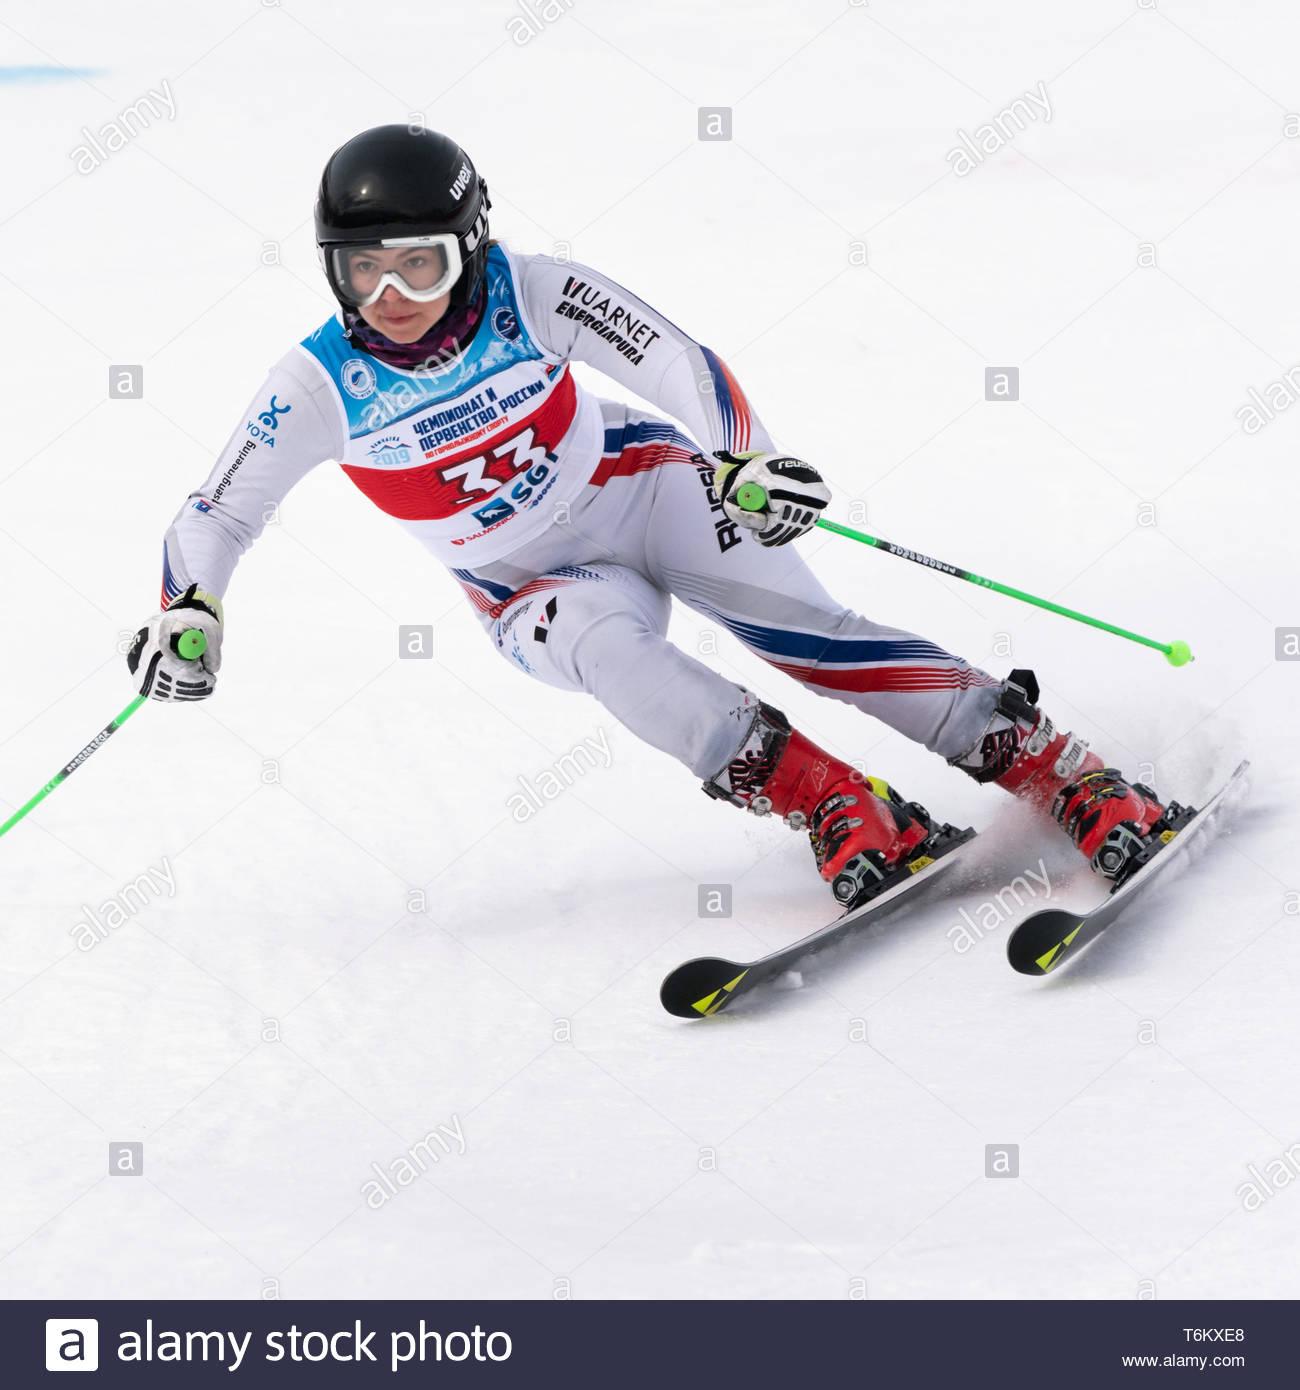 KAMCHATKA PENINSULA, RUSSIA - APR 2, 2019: Mountain skier Delhman Lidiya (Krasnoyarsk) skiing down mount slope. Russian Women's Alpine Skiing Cup Inte - Stock Image